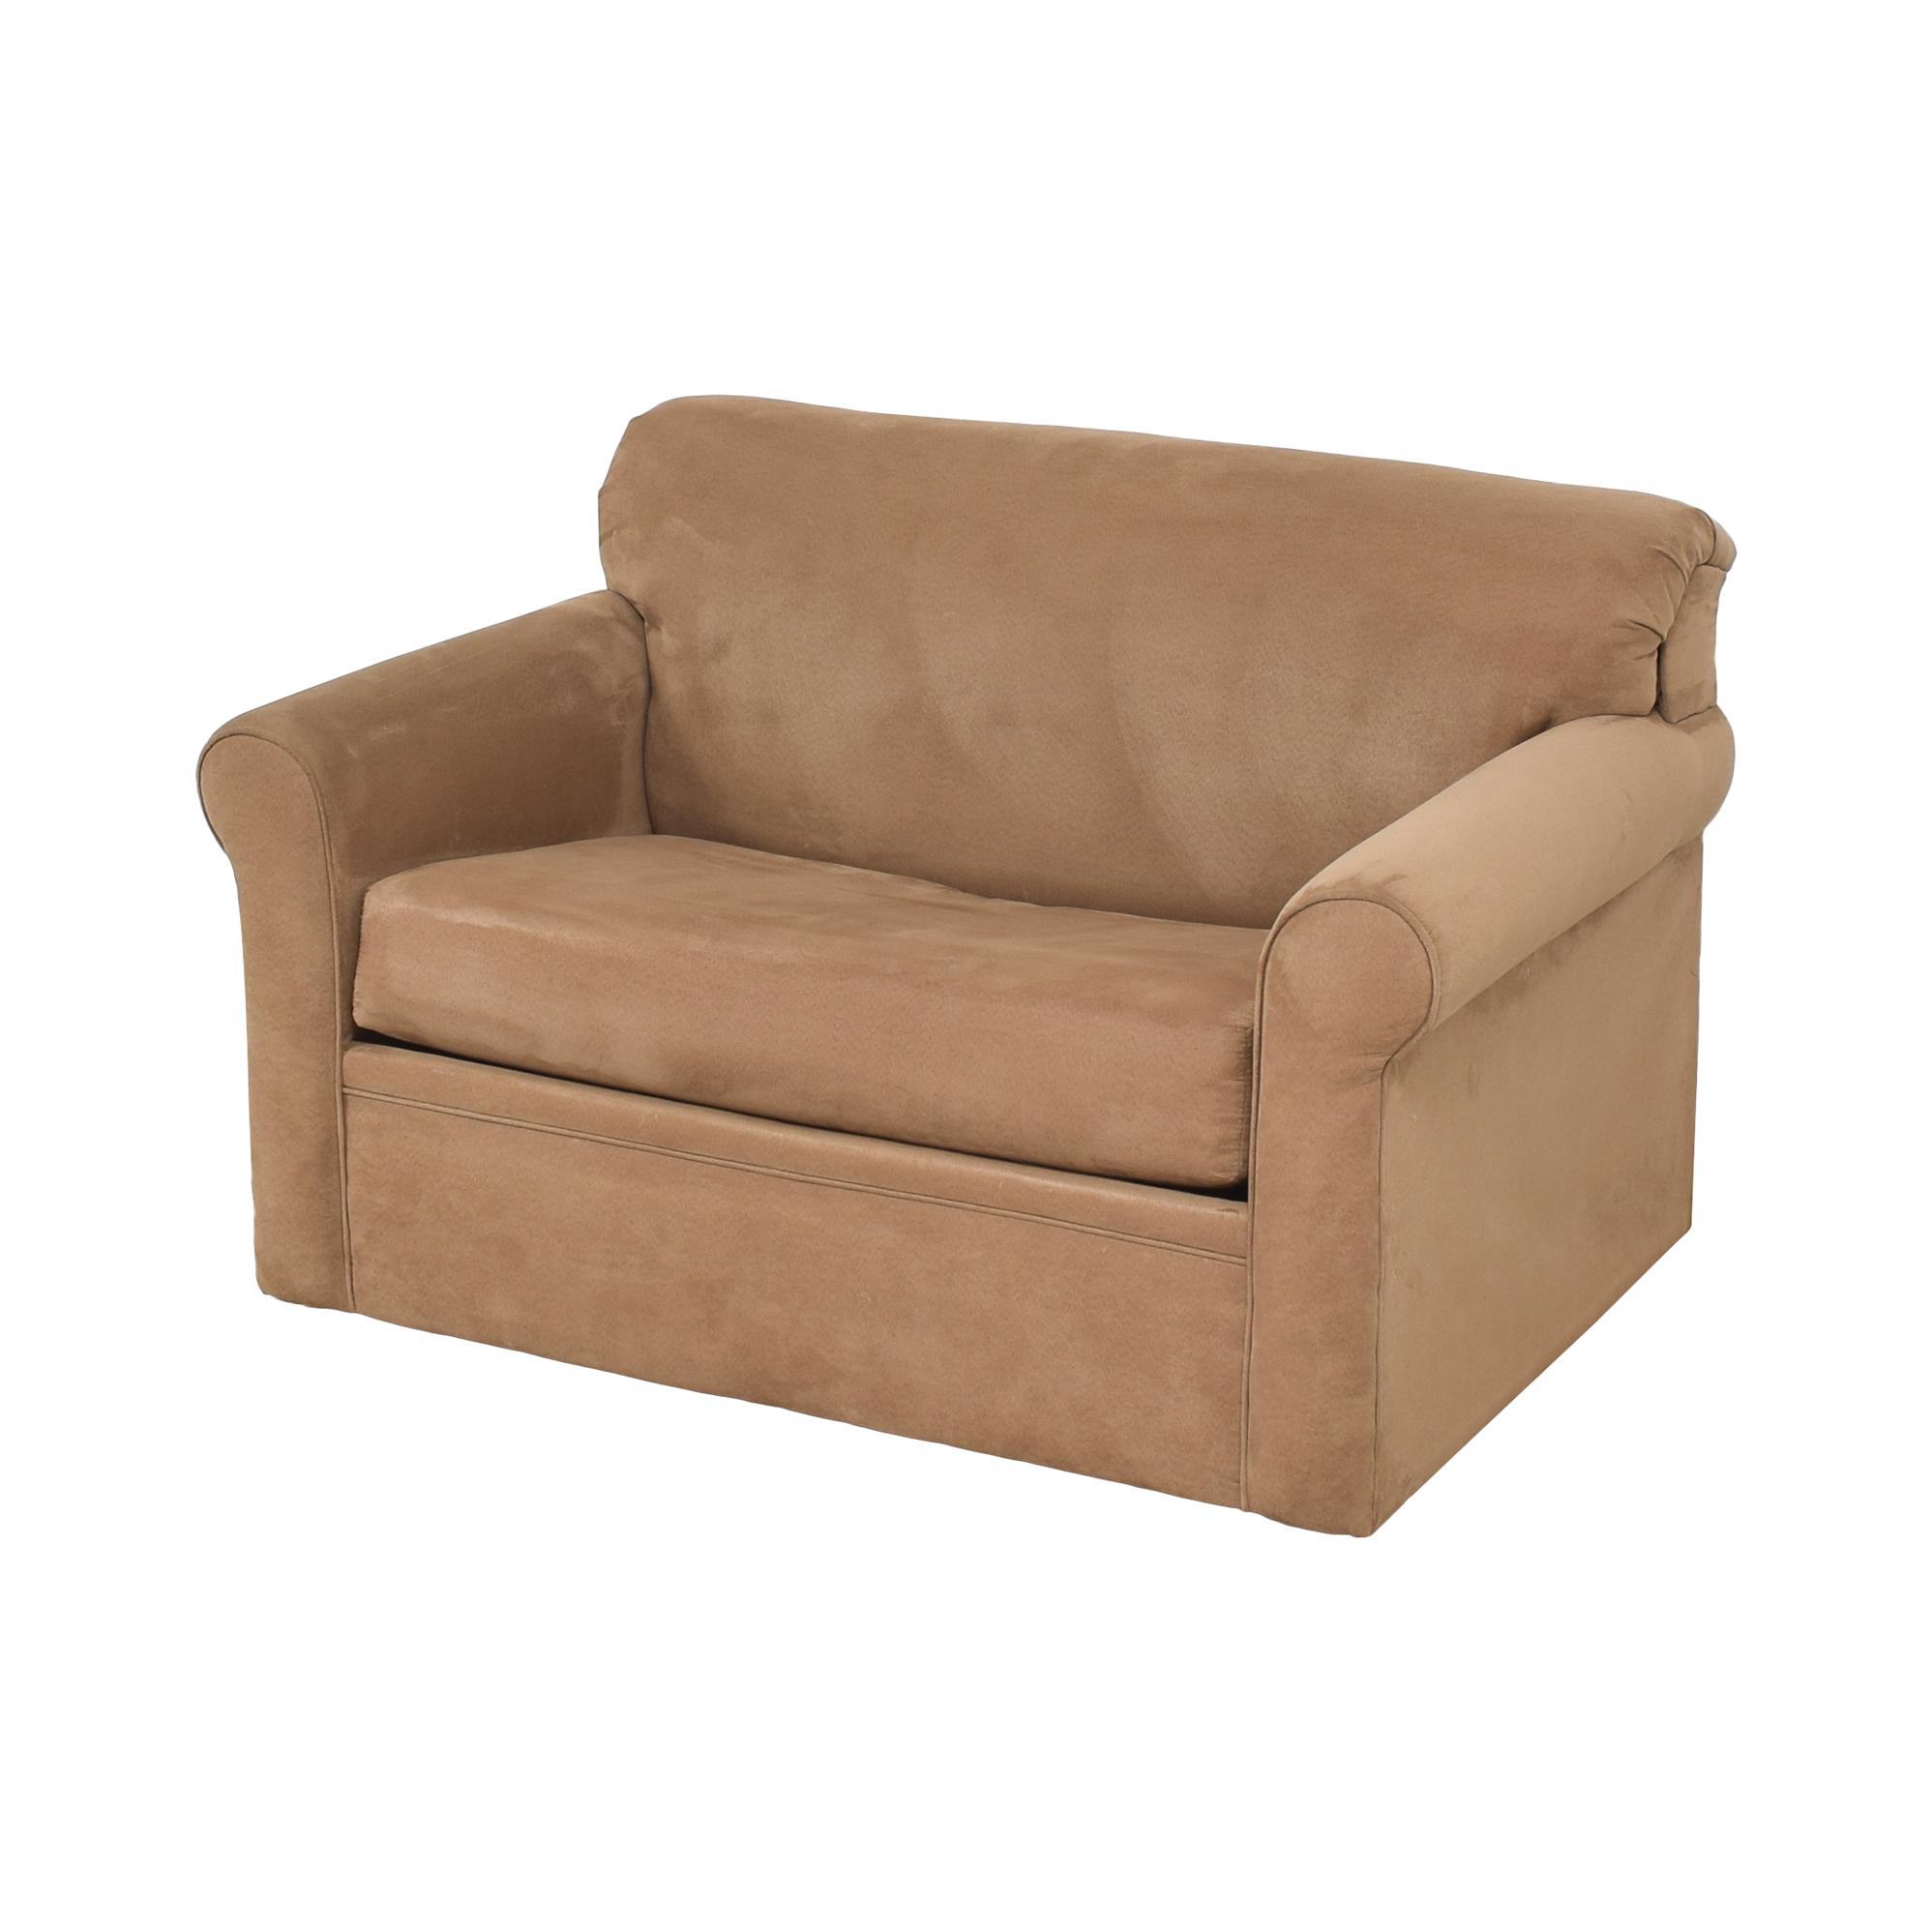 shop Overnight Sofa Sleeper Chair Overnight Sofa Loveseats